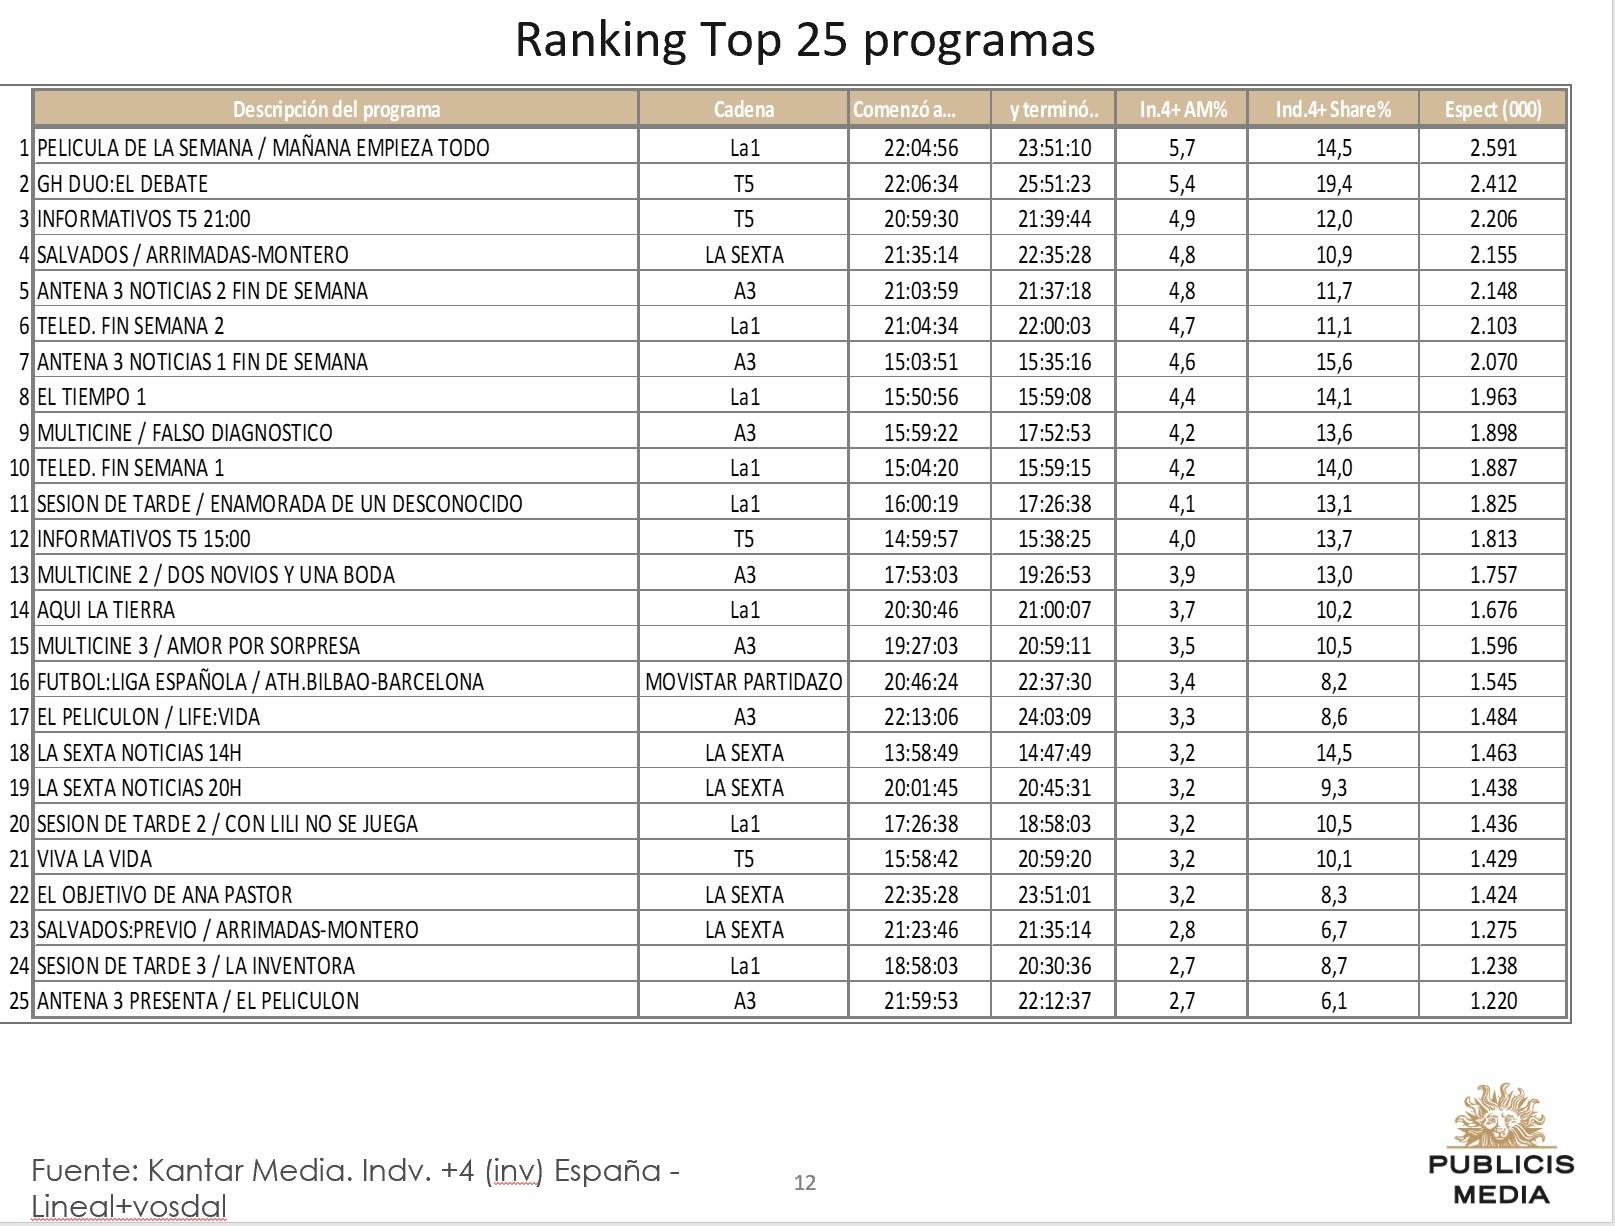 http://www.programapublicidad.com/wp-content/uploads/2019/02/Top-25-Publicis-media-10-feb-2019-programapublicidad-muy-grande.jpg